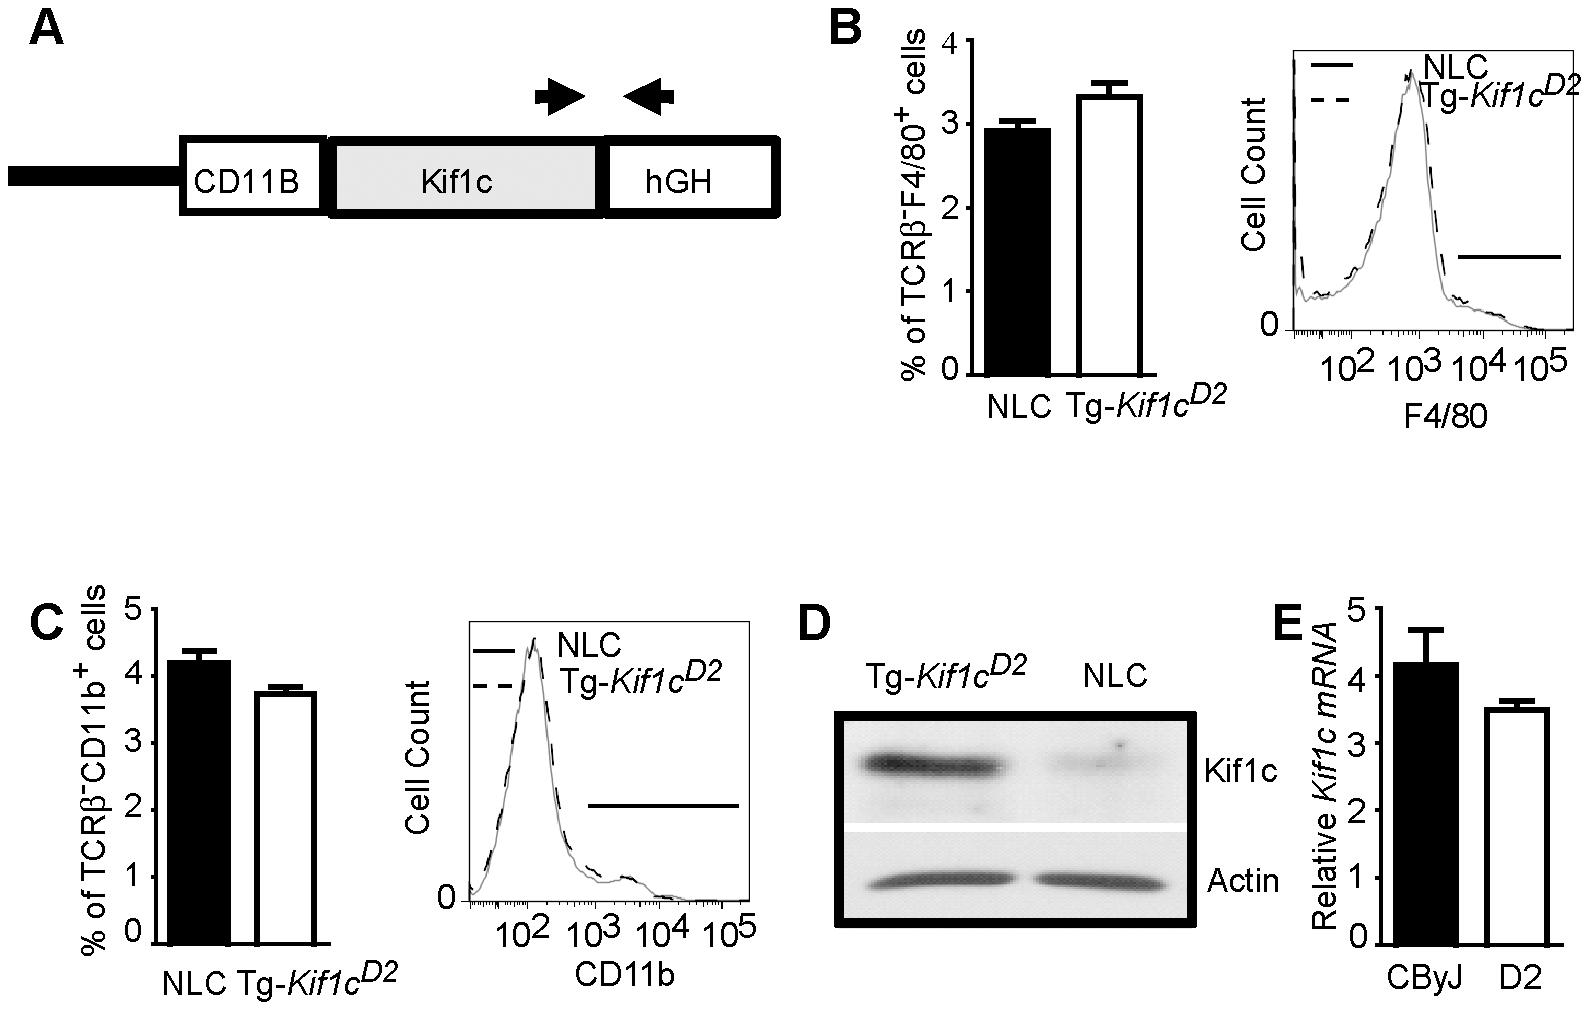 Generation of BALB/cByJ-<i>CD11B</i>-<i>Kif1c<sup>D2</sup></i> transgenic (Tg-<i>Kif1c<sup>D2</sup></i>) mice.